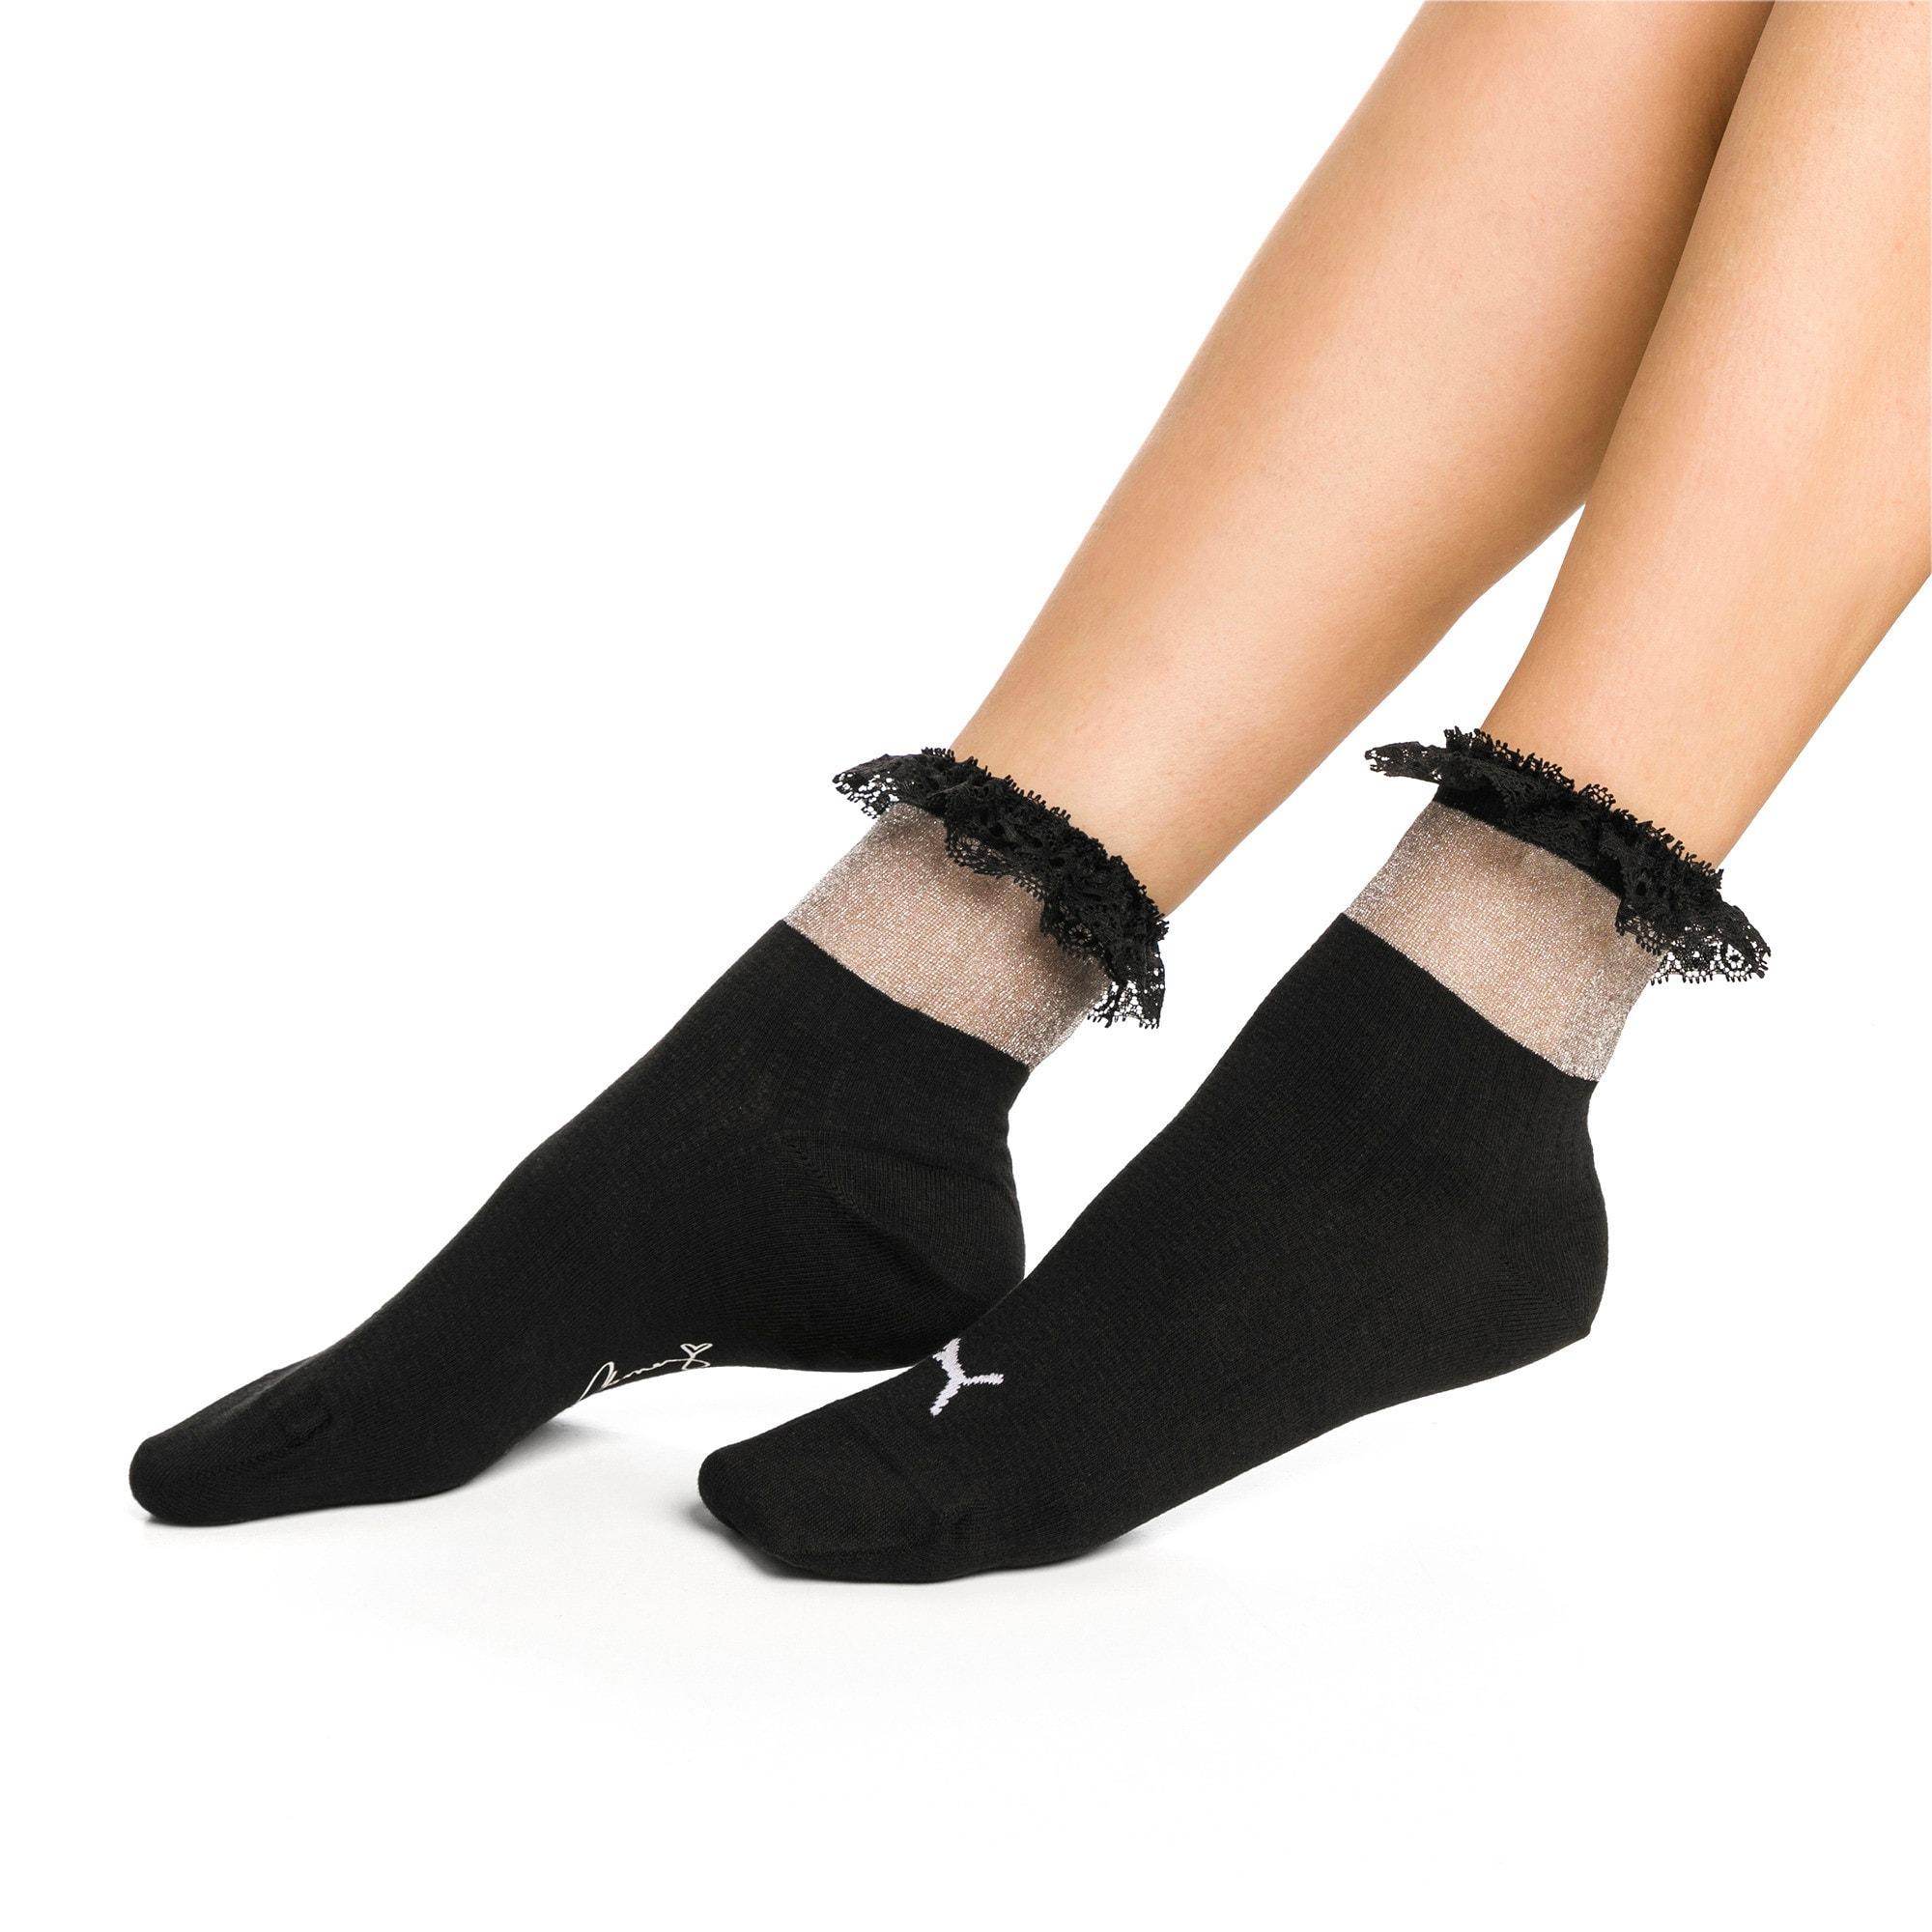 Thumbnail 2 of PUMA x SG Ruffle Short Crew Socks, black, medium